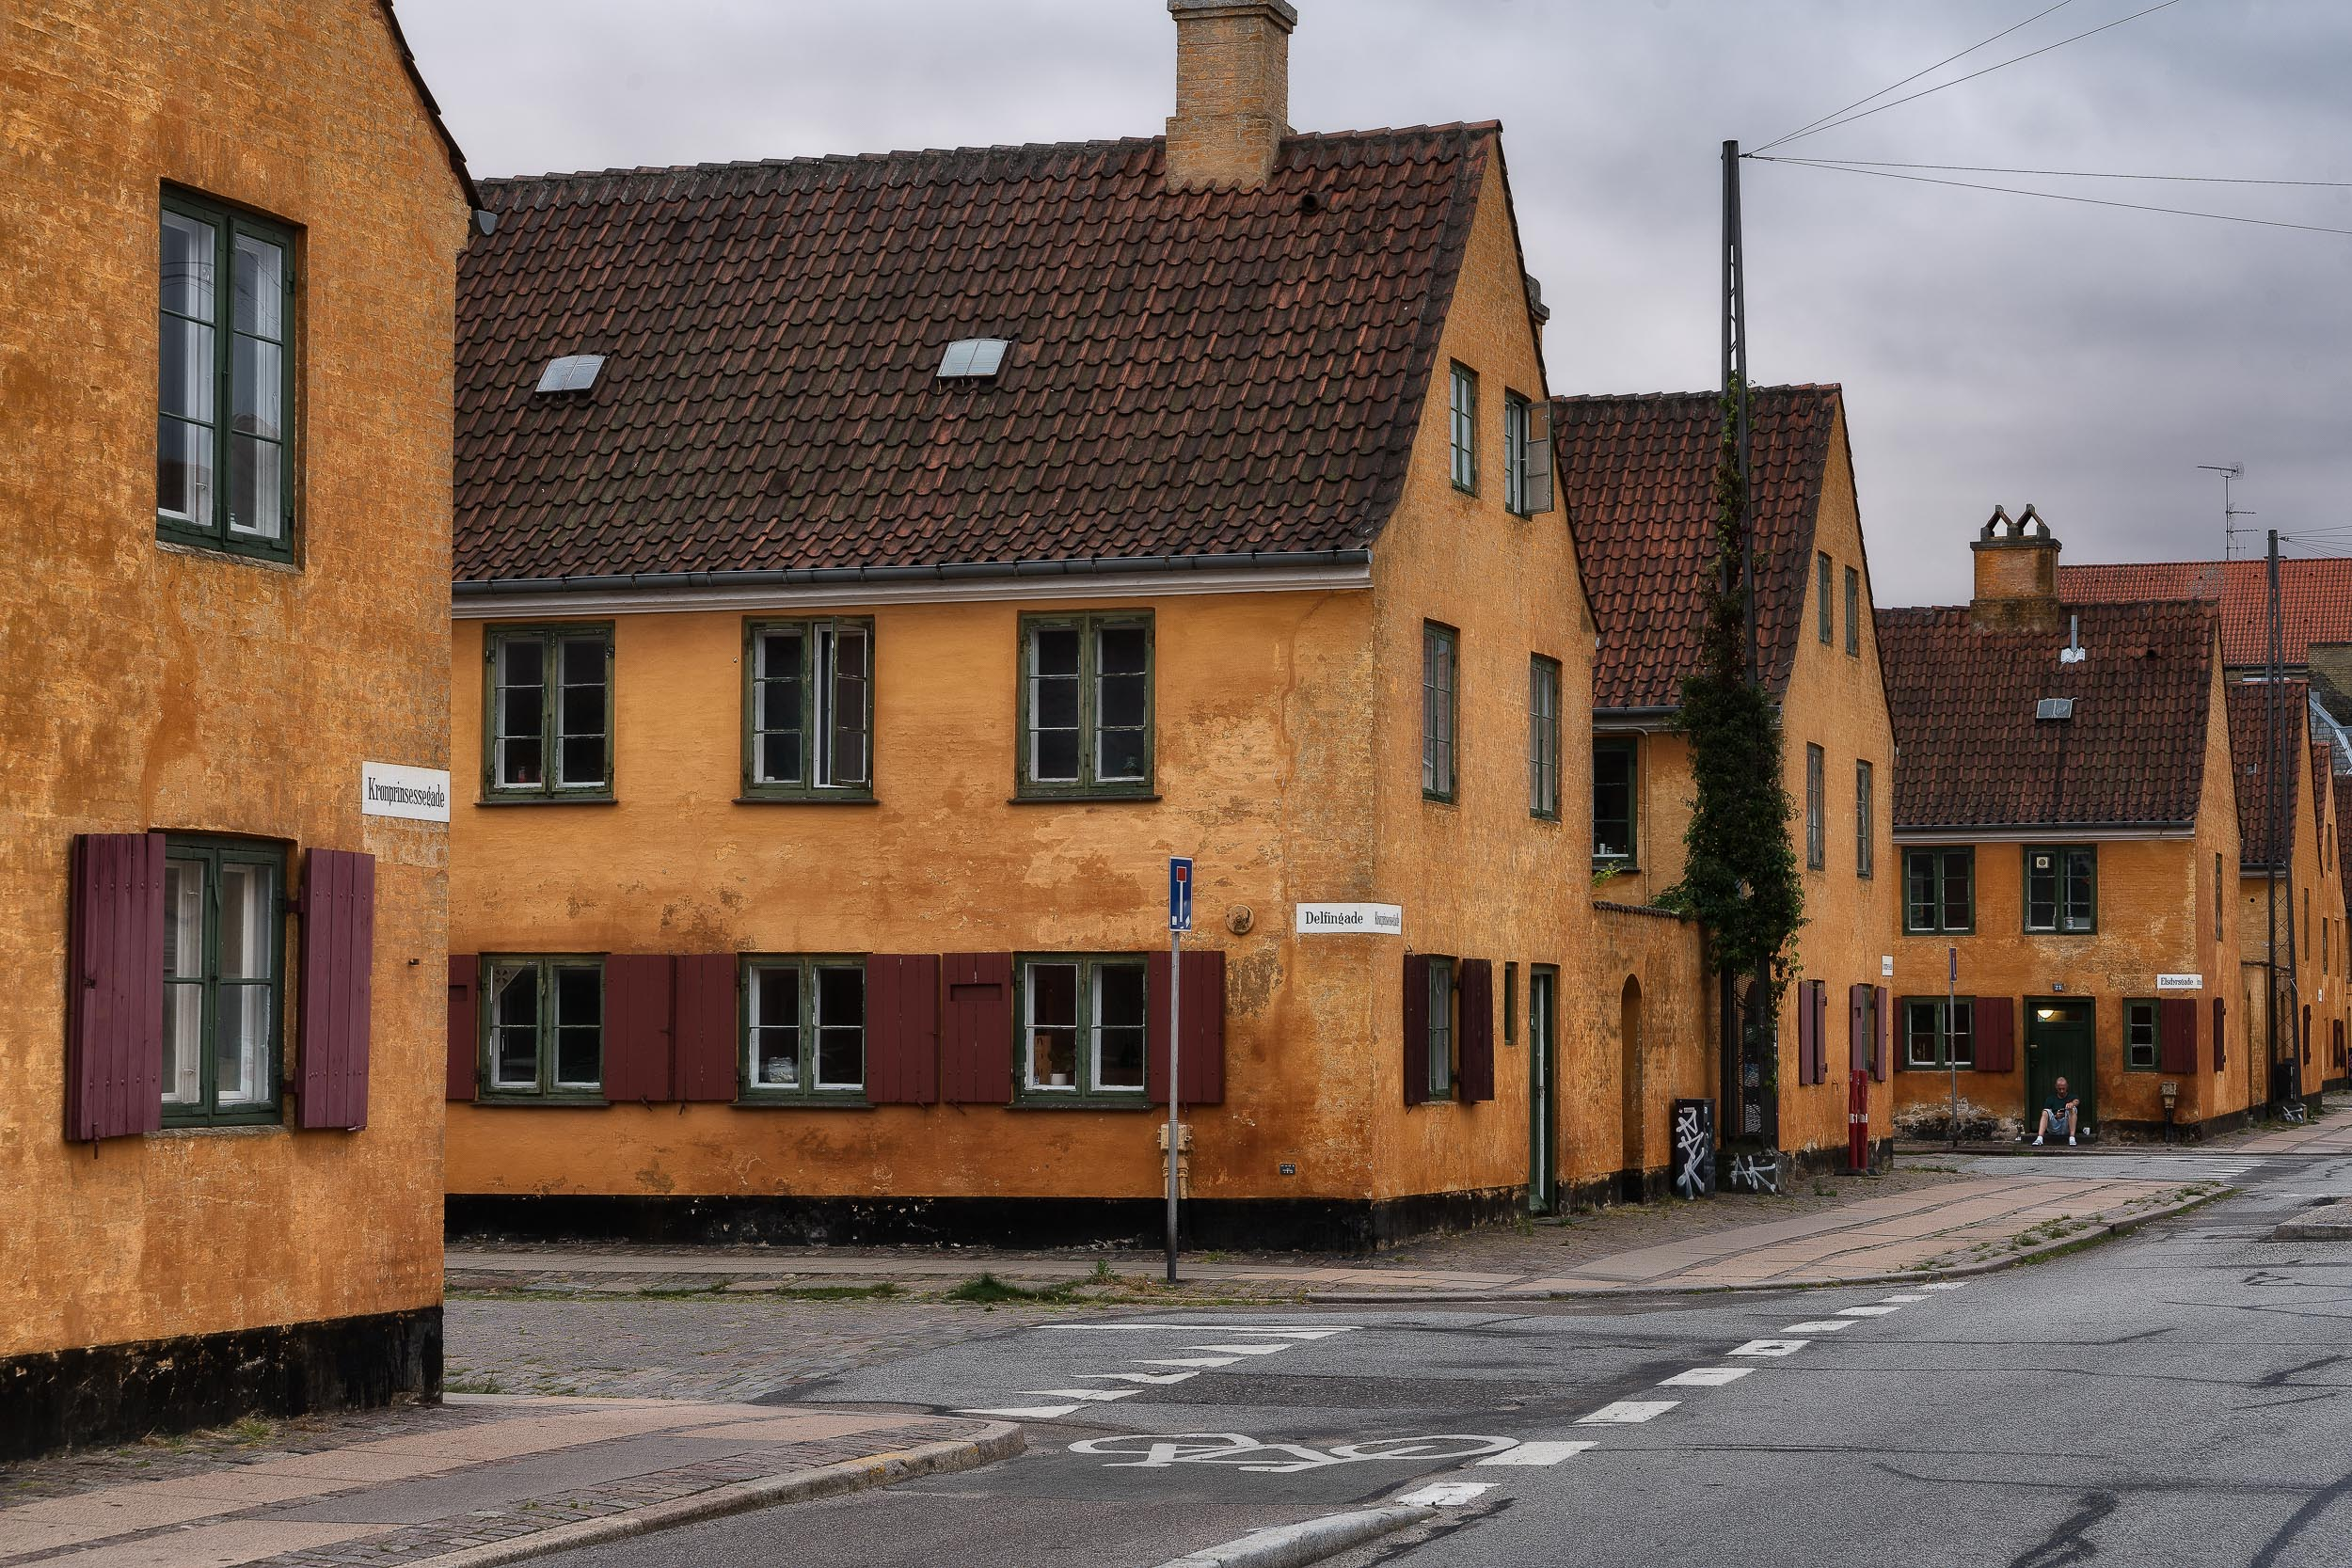 Parallel running streets of    orange painted housing    in    Copenhagen, Denmark   .